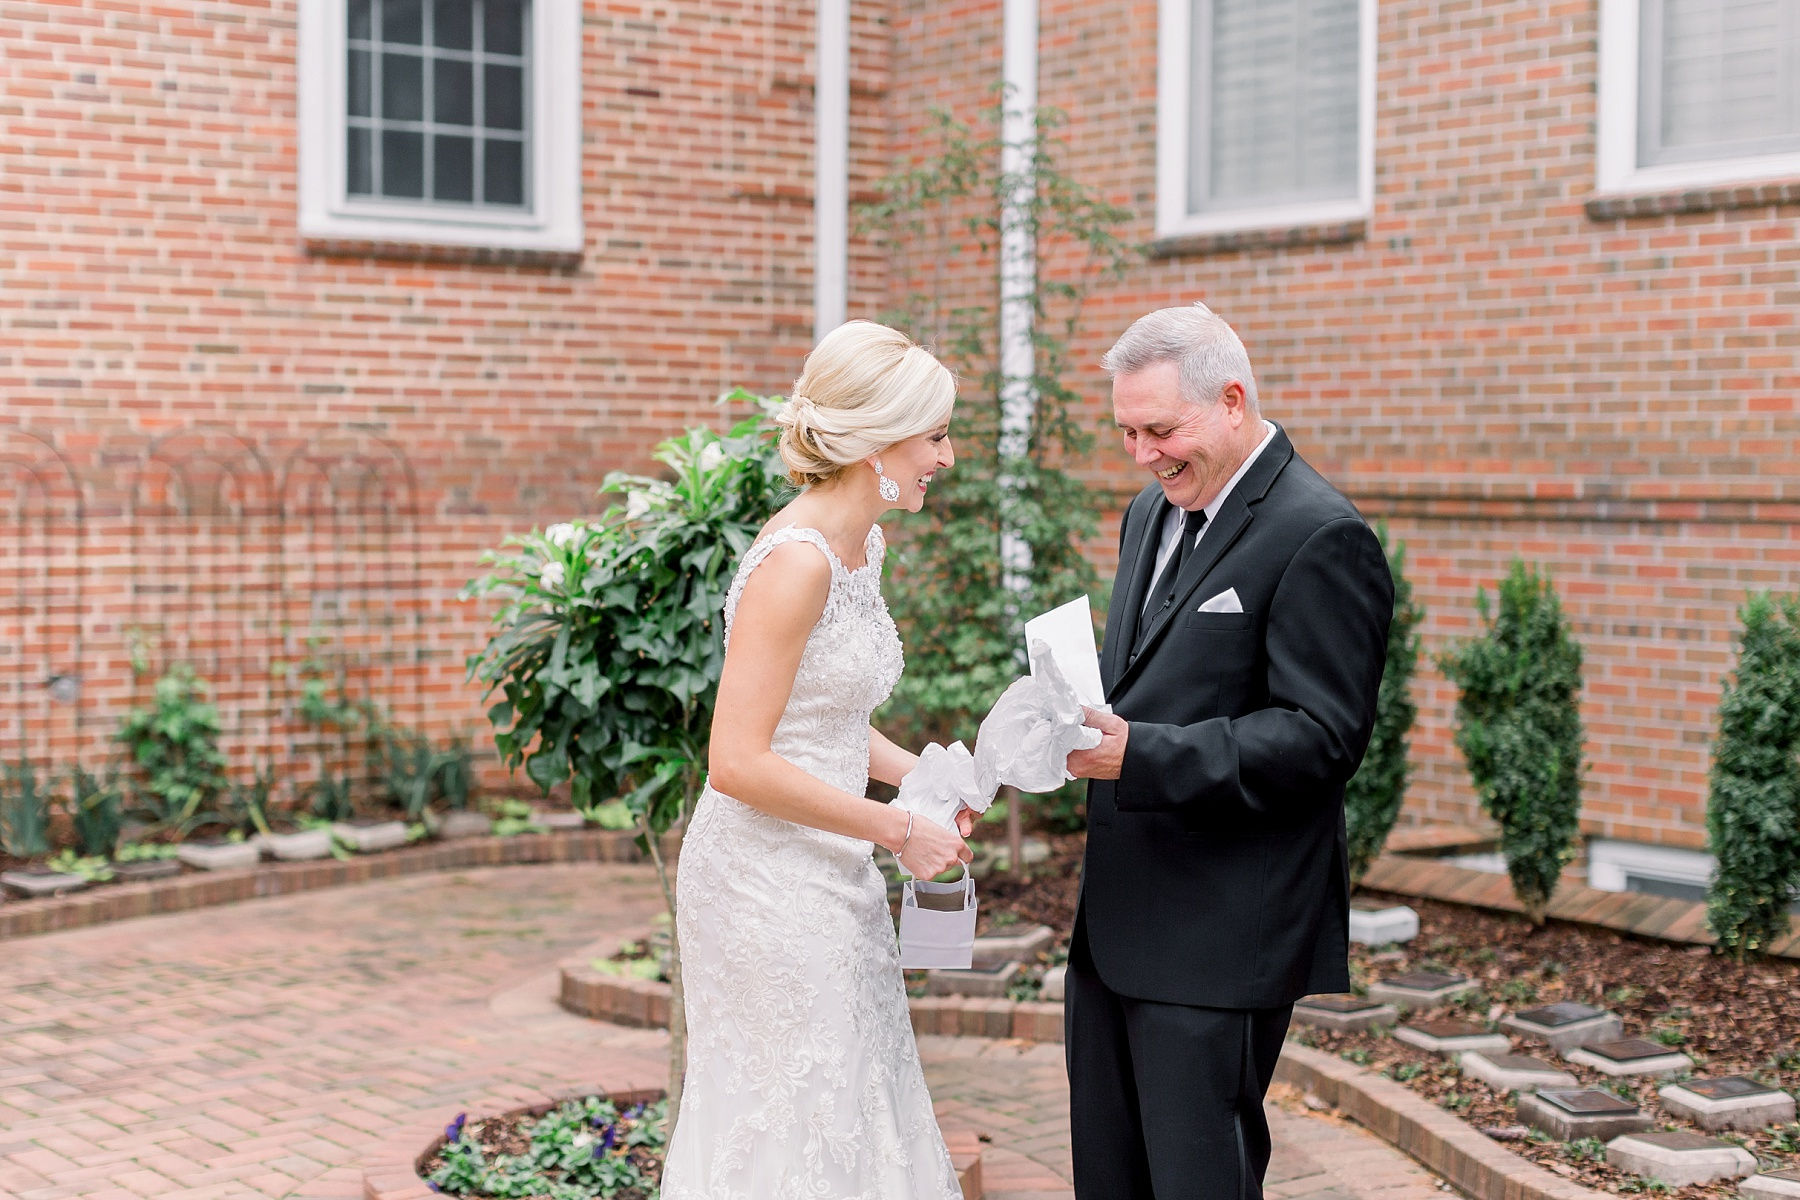 midwest-adventurous-wedding-photographer-elizabeth-ladean-photography-photo_4714.jpg